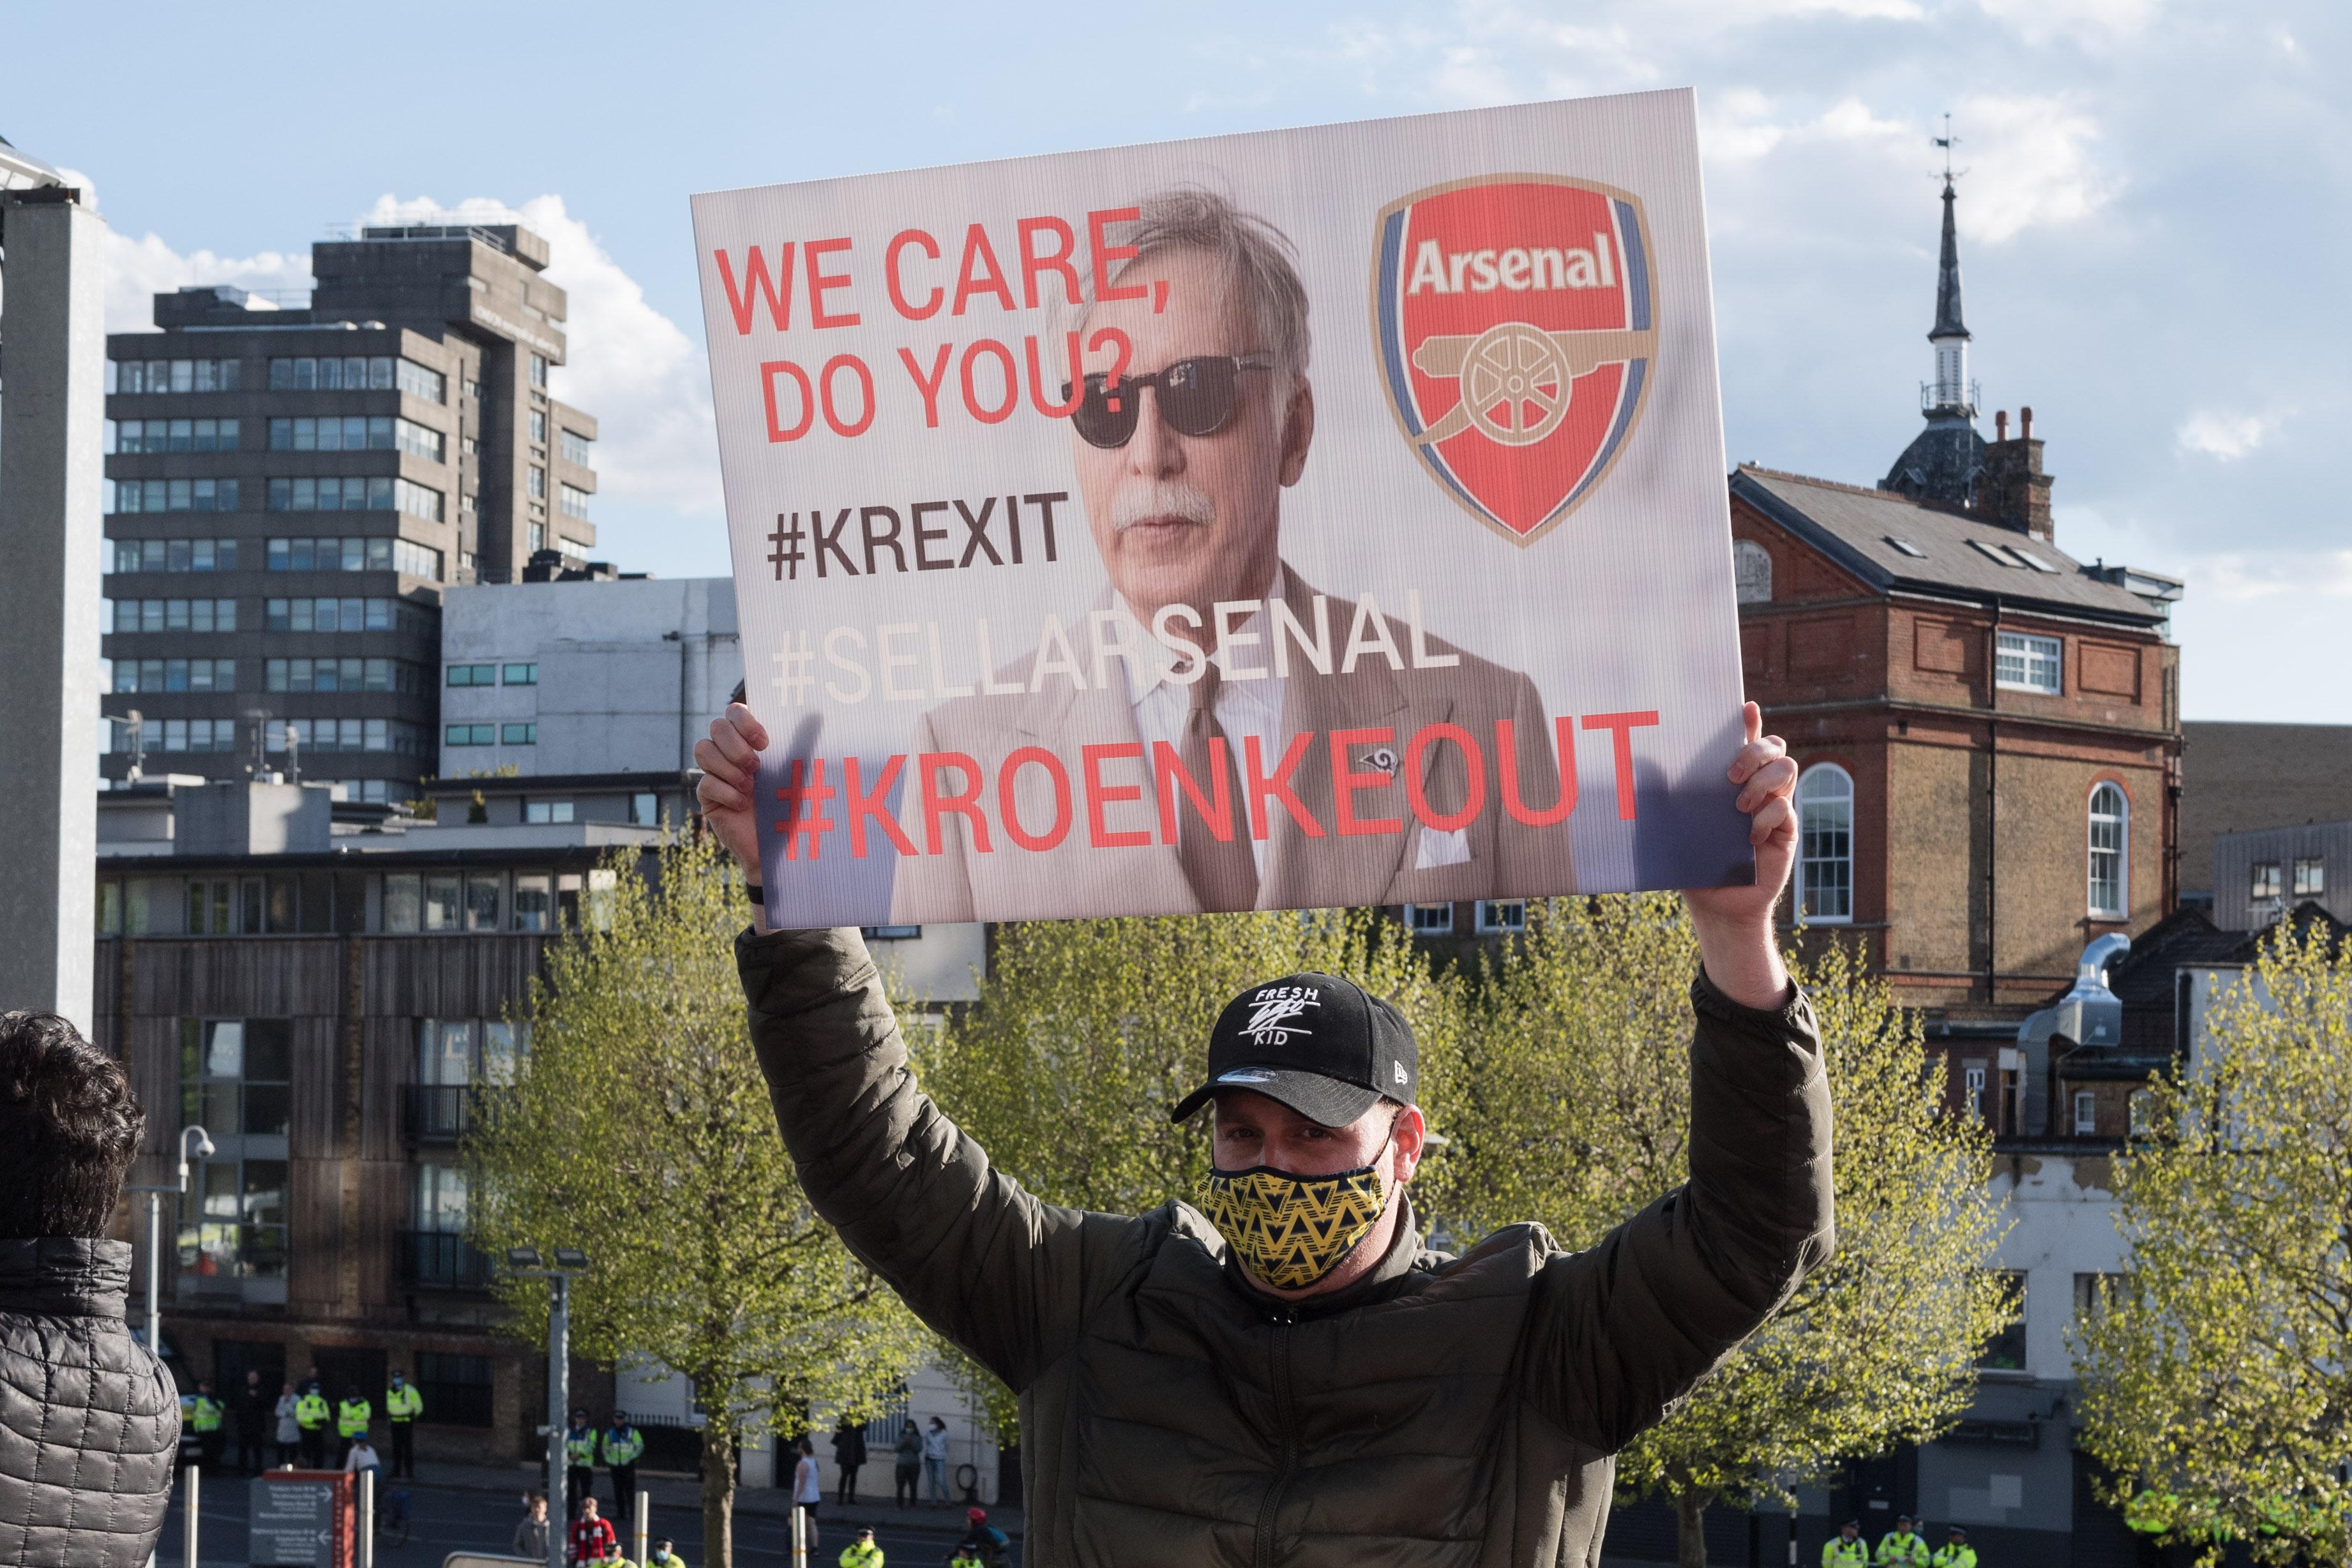 Spotify Founder Daniel Ek's Offer to Buy Arsenal Rejected by Kroenkes thumbnail